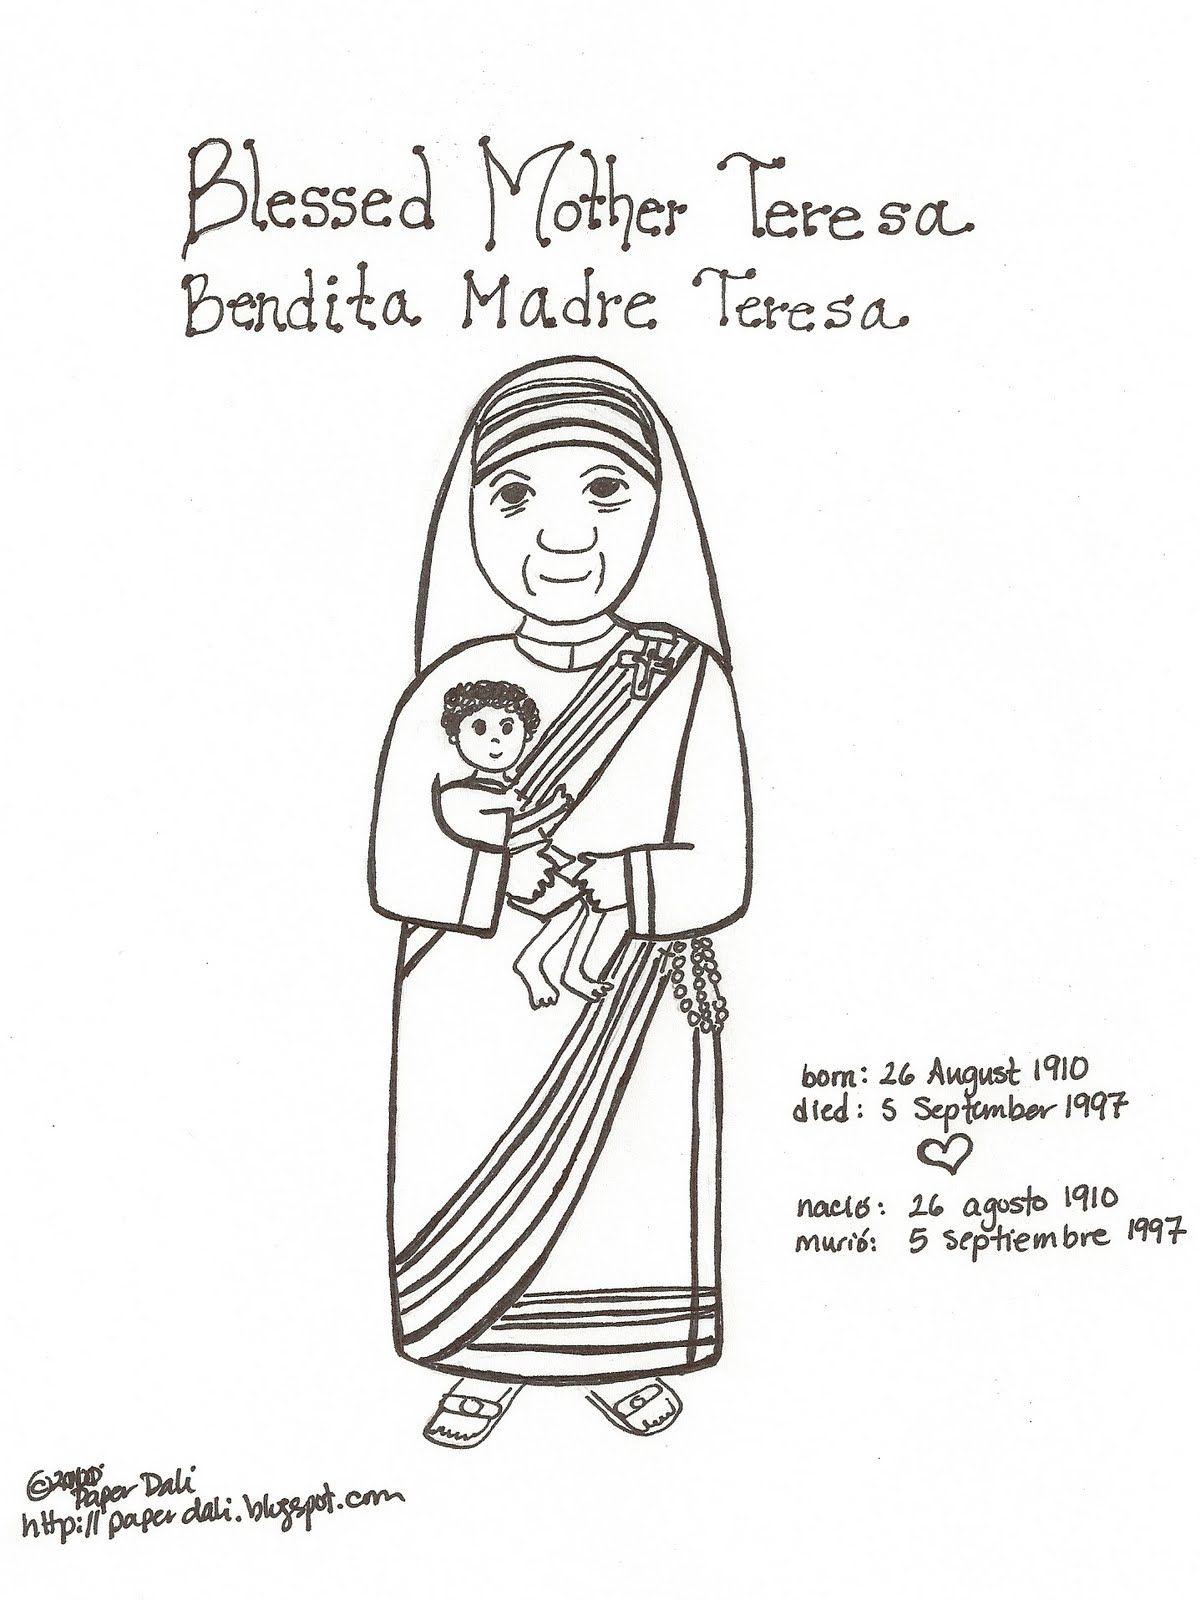 Paper Dali Blessed Mother Teresa Of Calcutta Bendita Madre Teresa